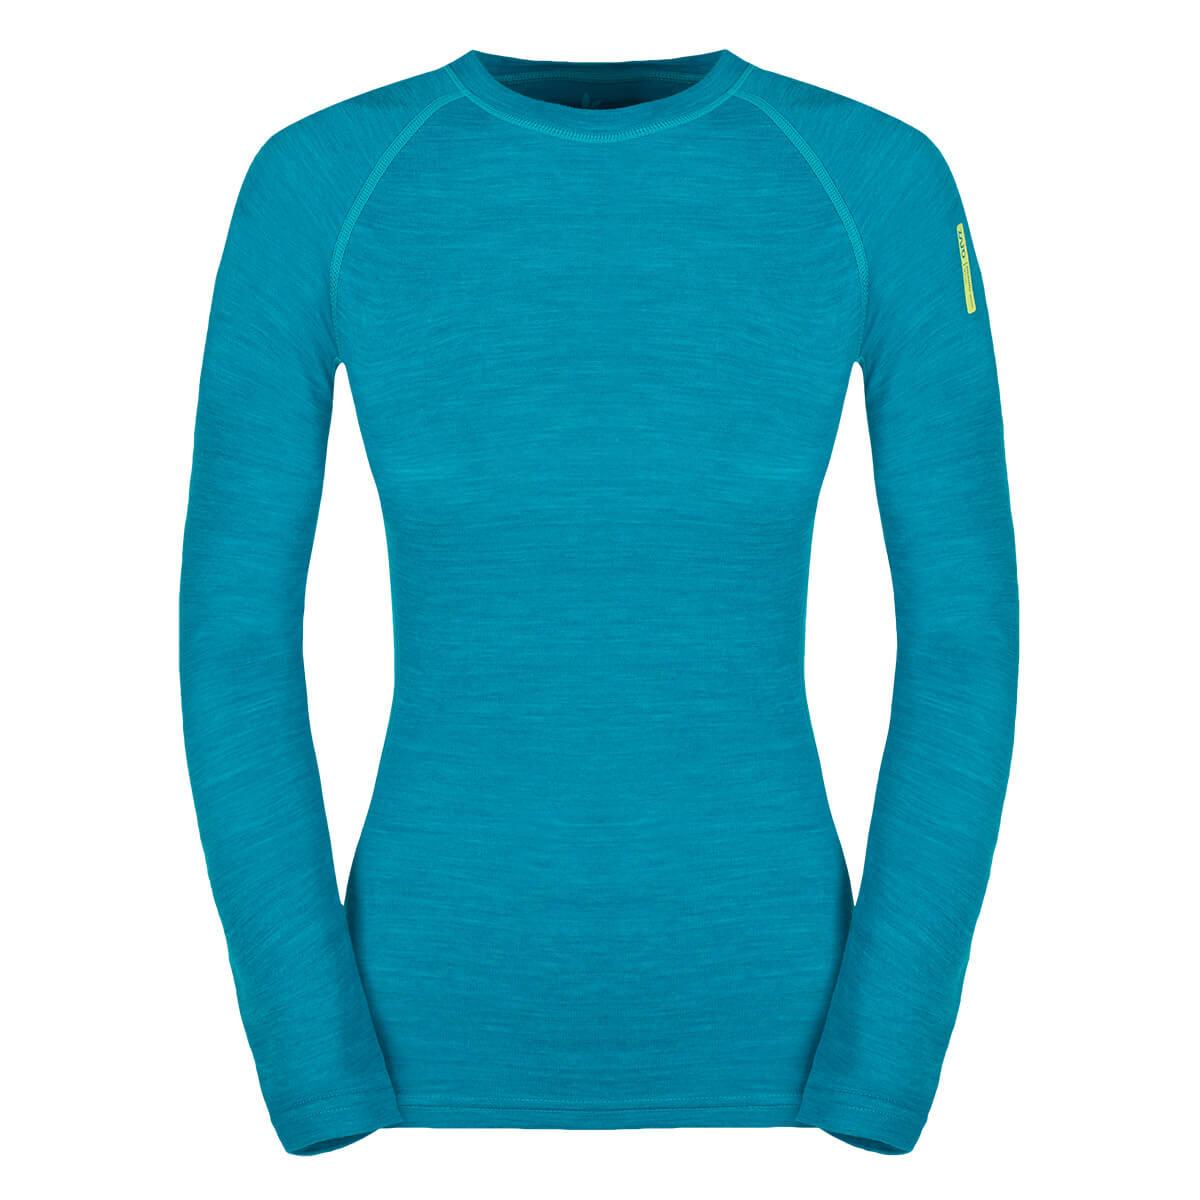 Dámske tričko Zajo Nora Merino W T-shirt LS Enamel Blue - veľkosť XS